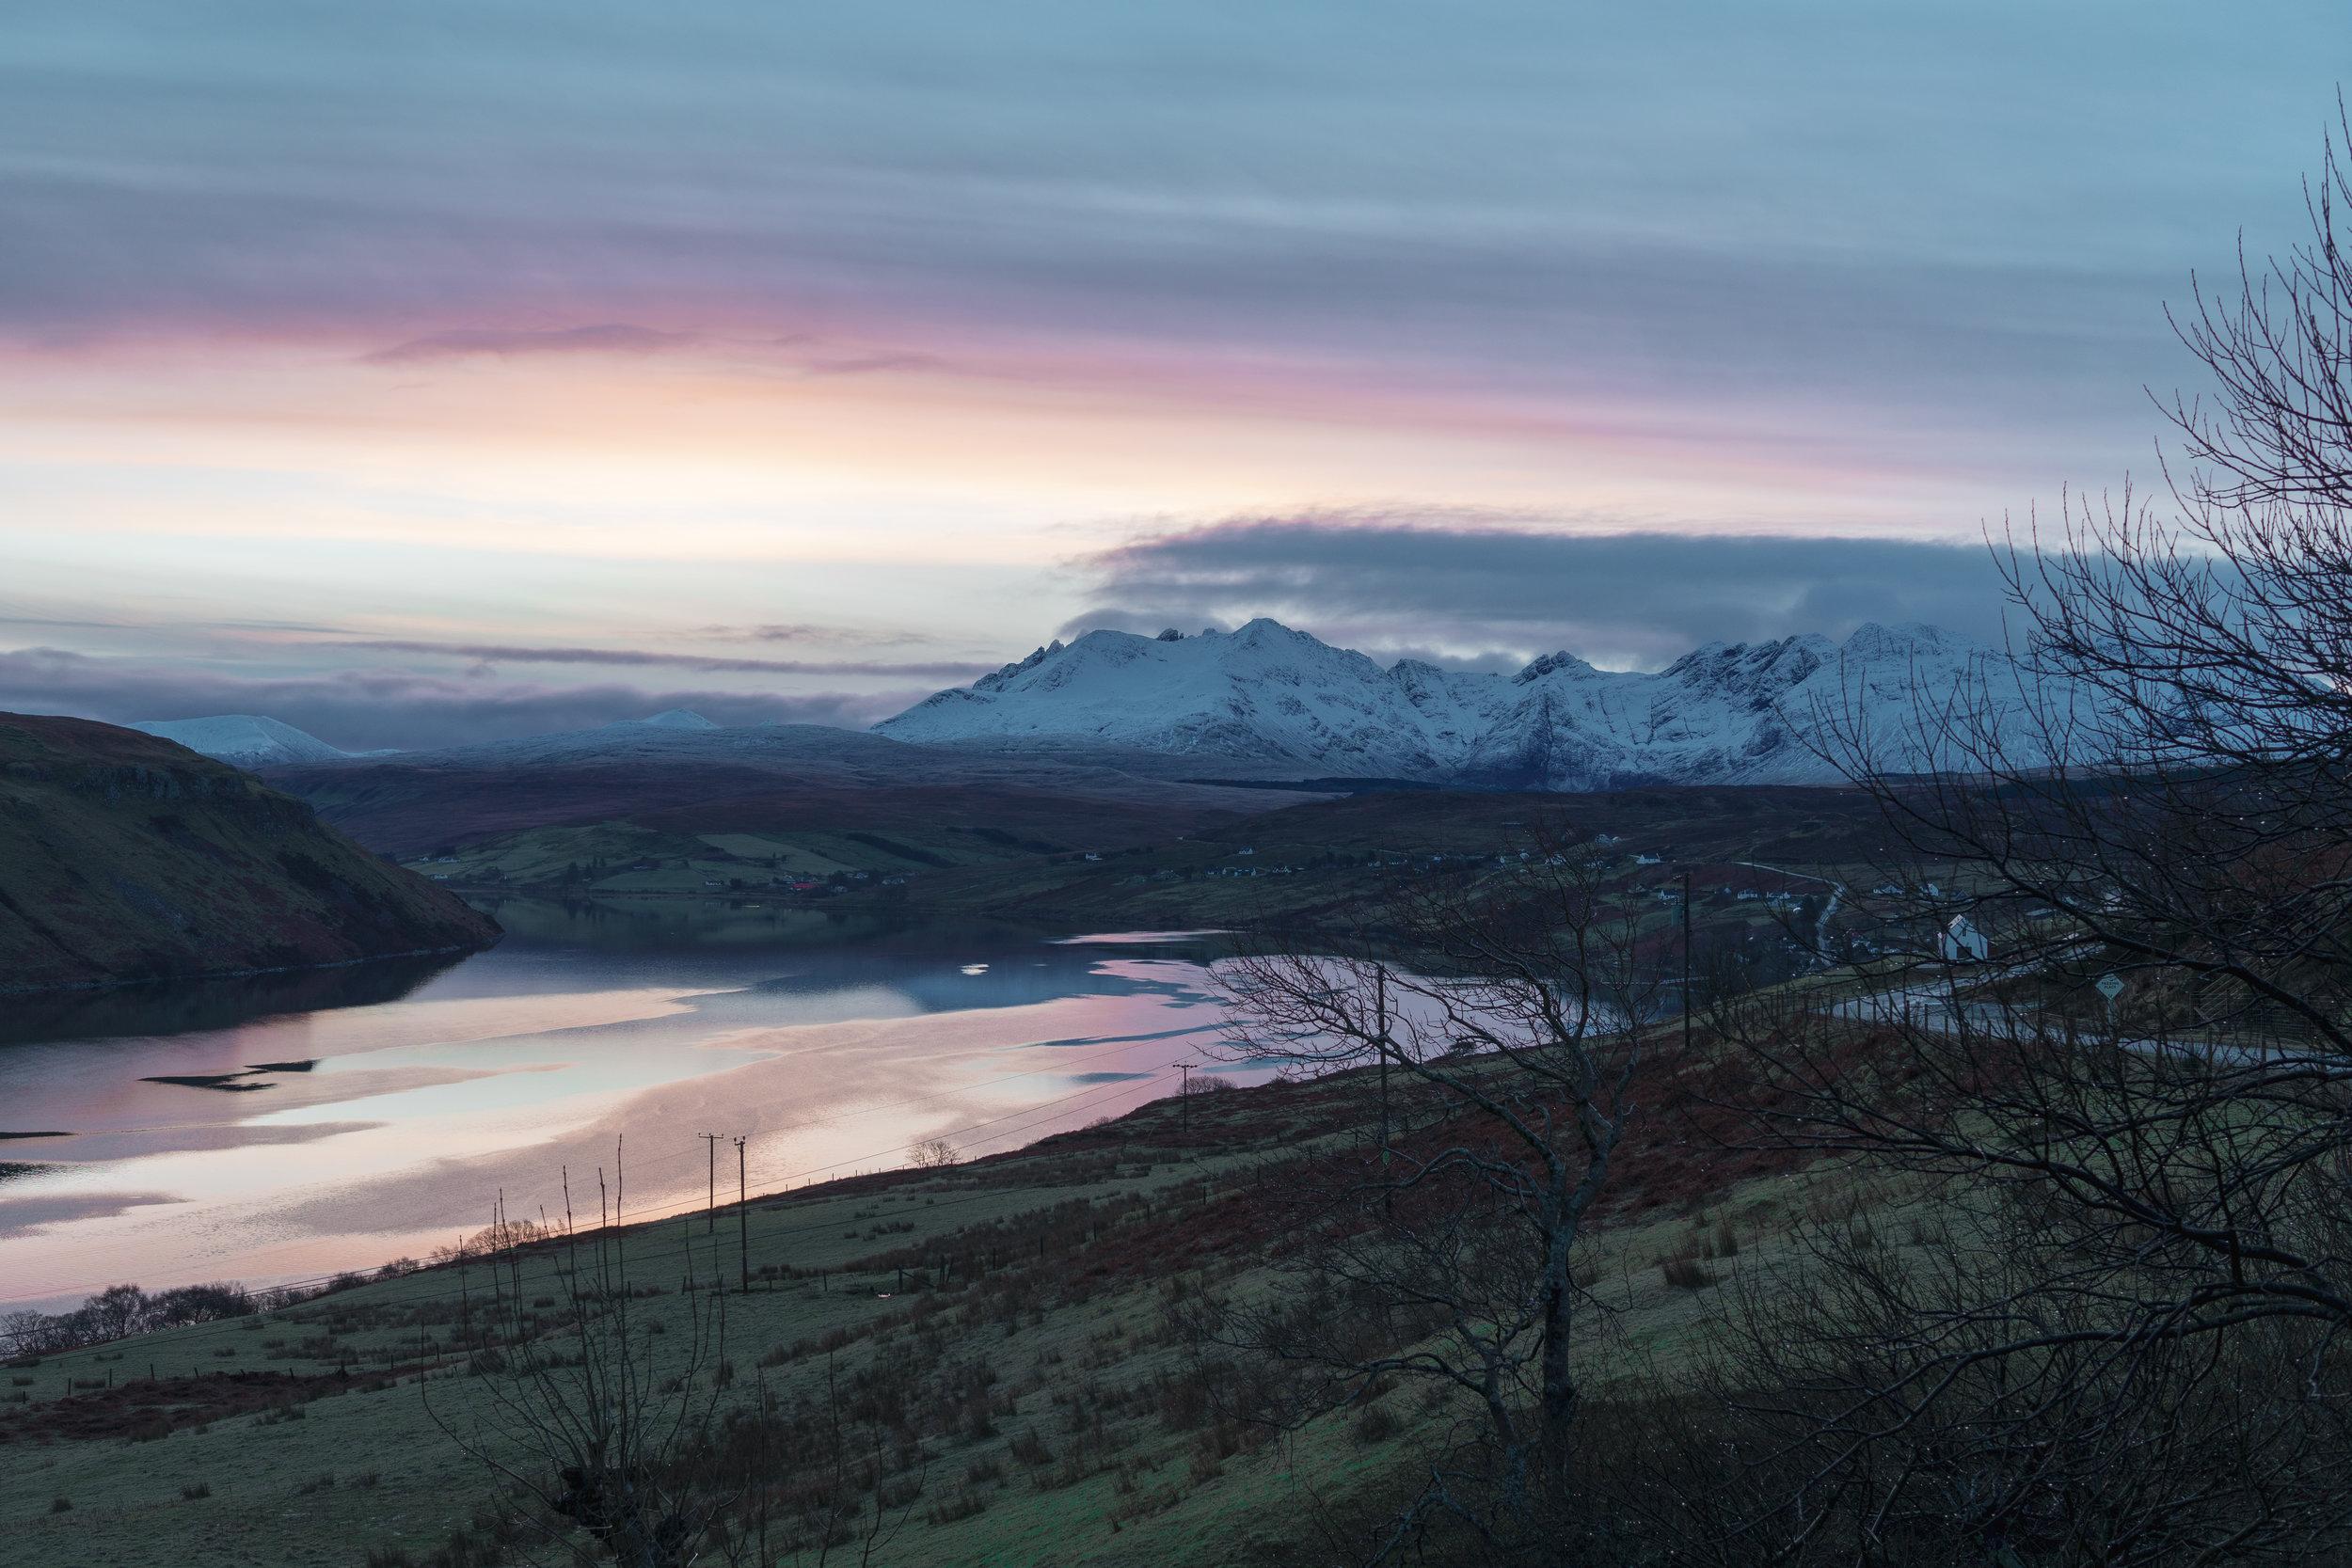 Isle-of-Skye-Eilean-Donan (3).jpg